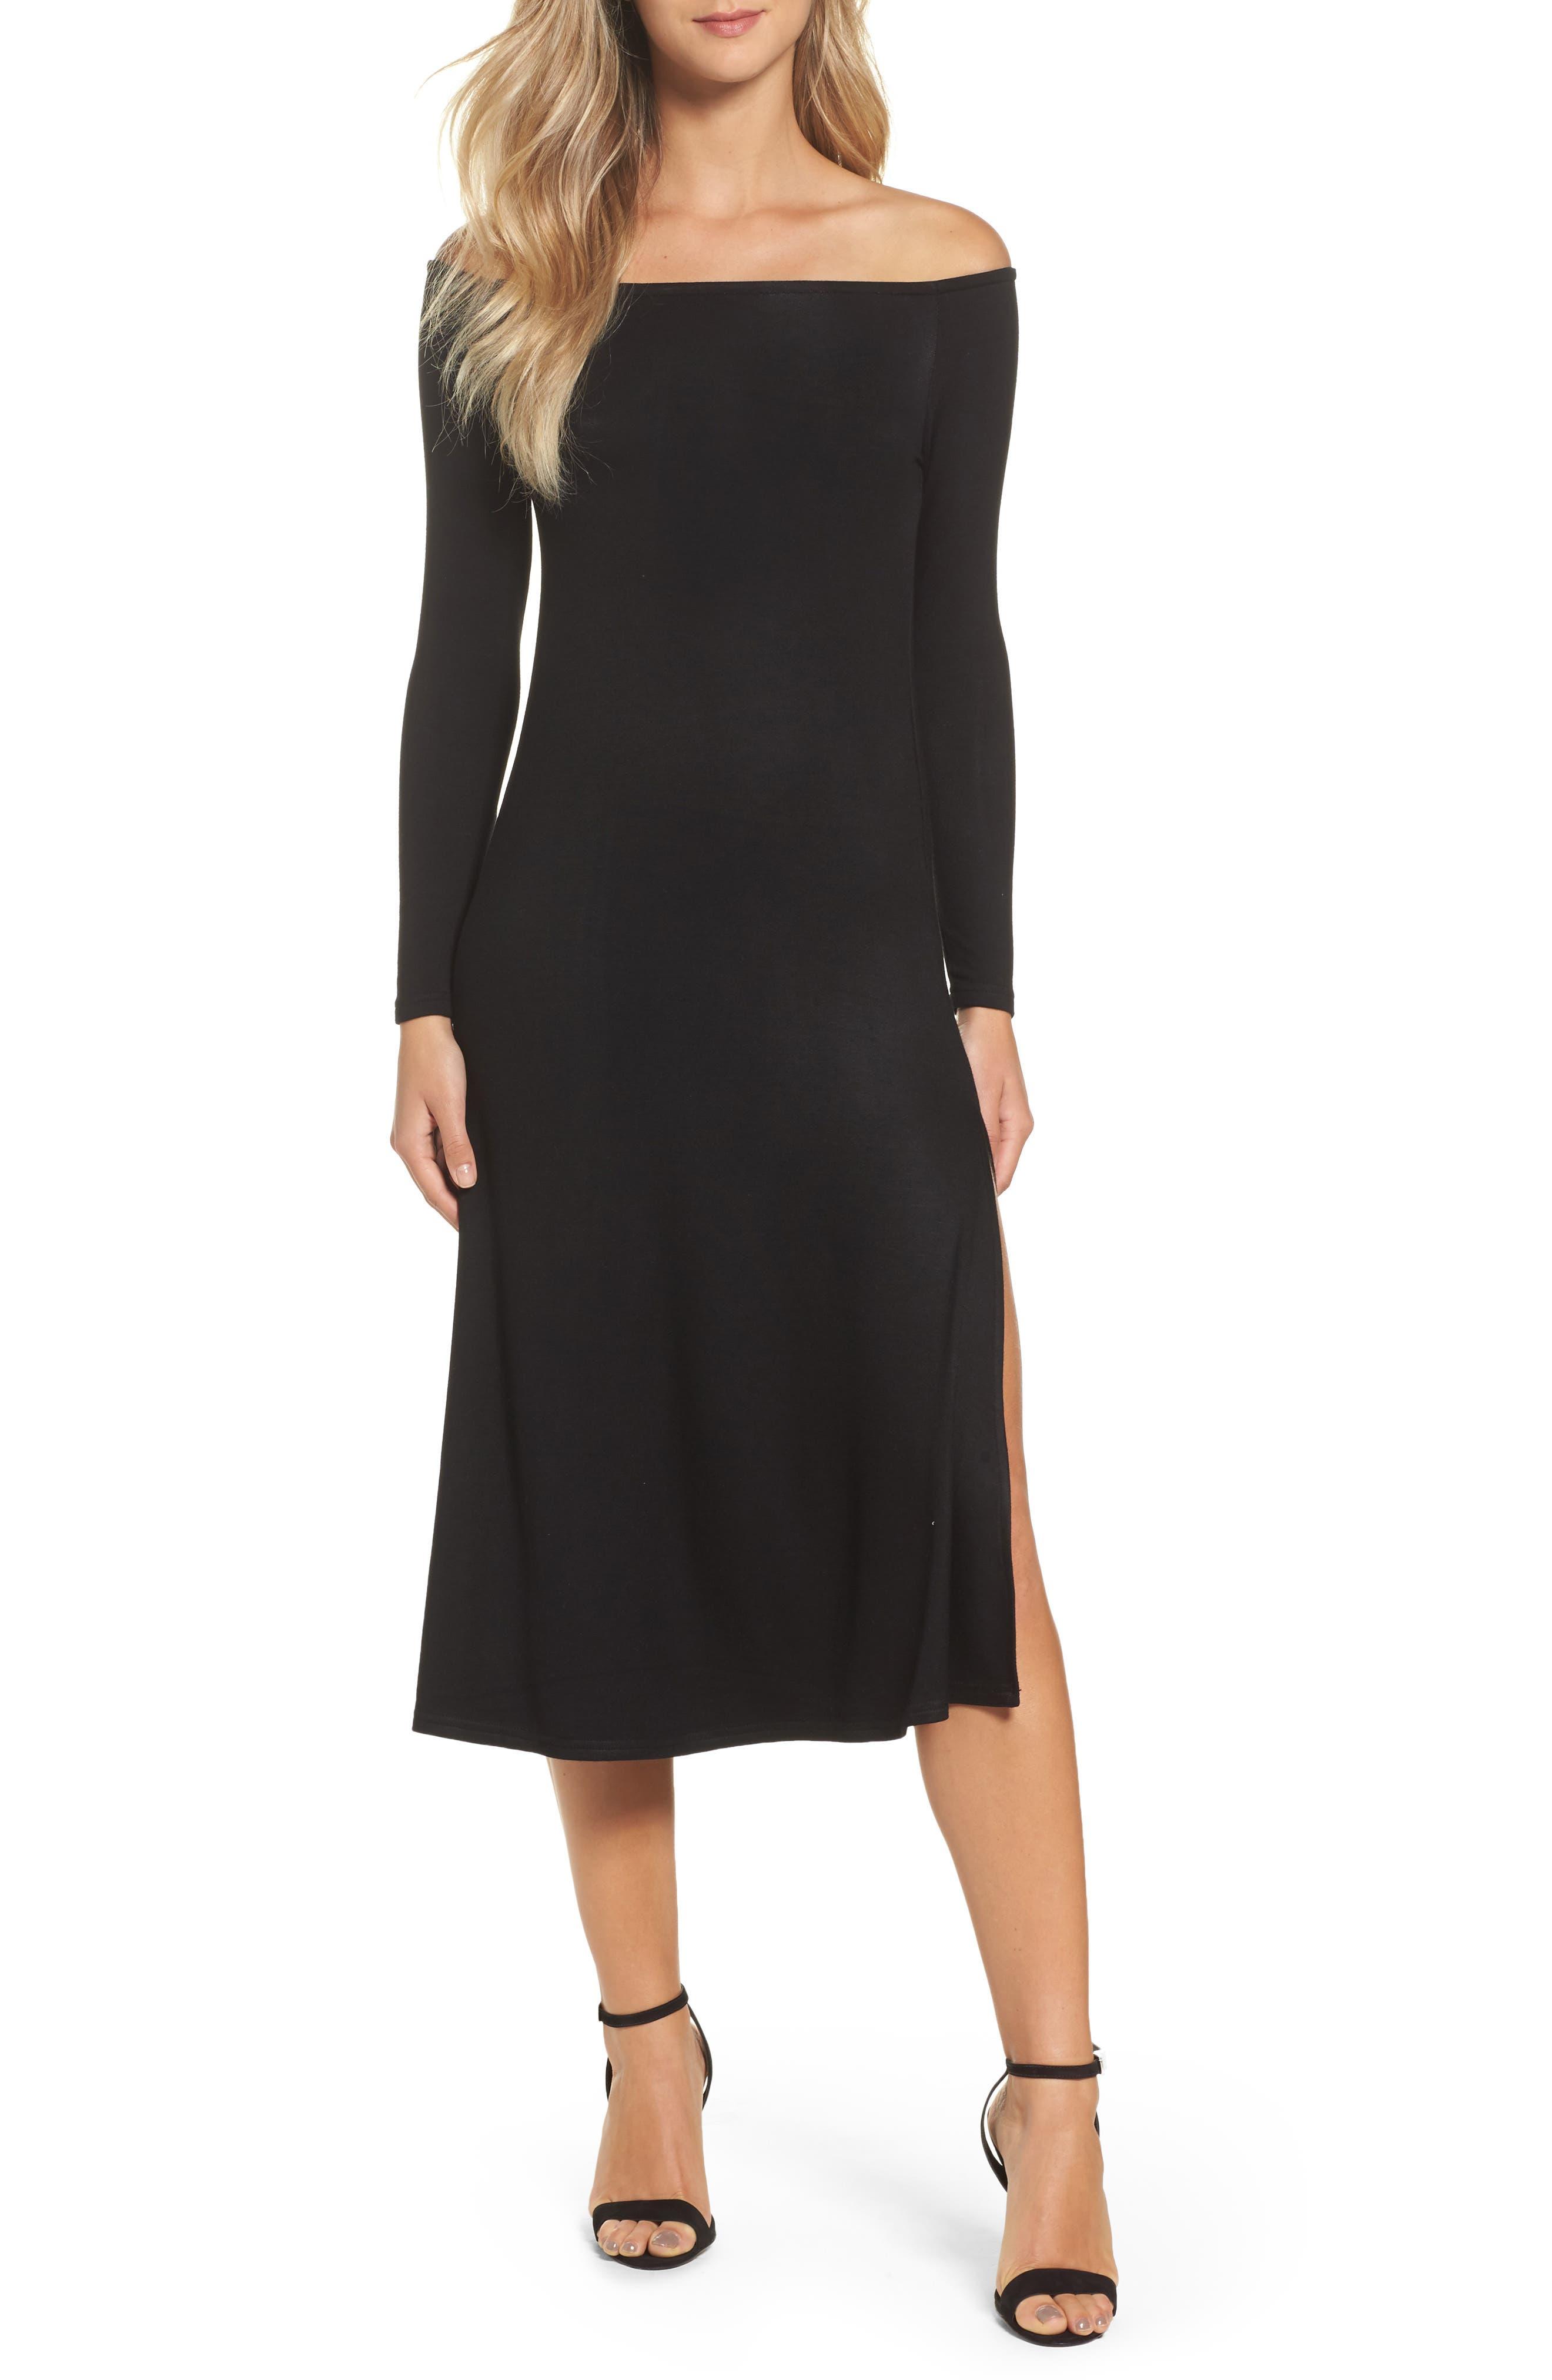 Blair Off the Shoulder A-Line Dress,                         Main,                         color, Black